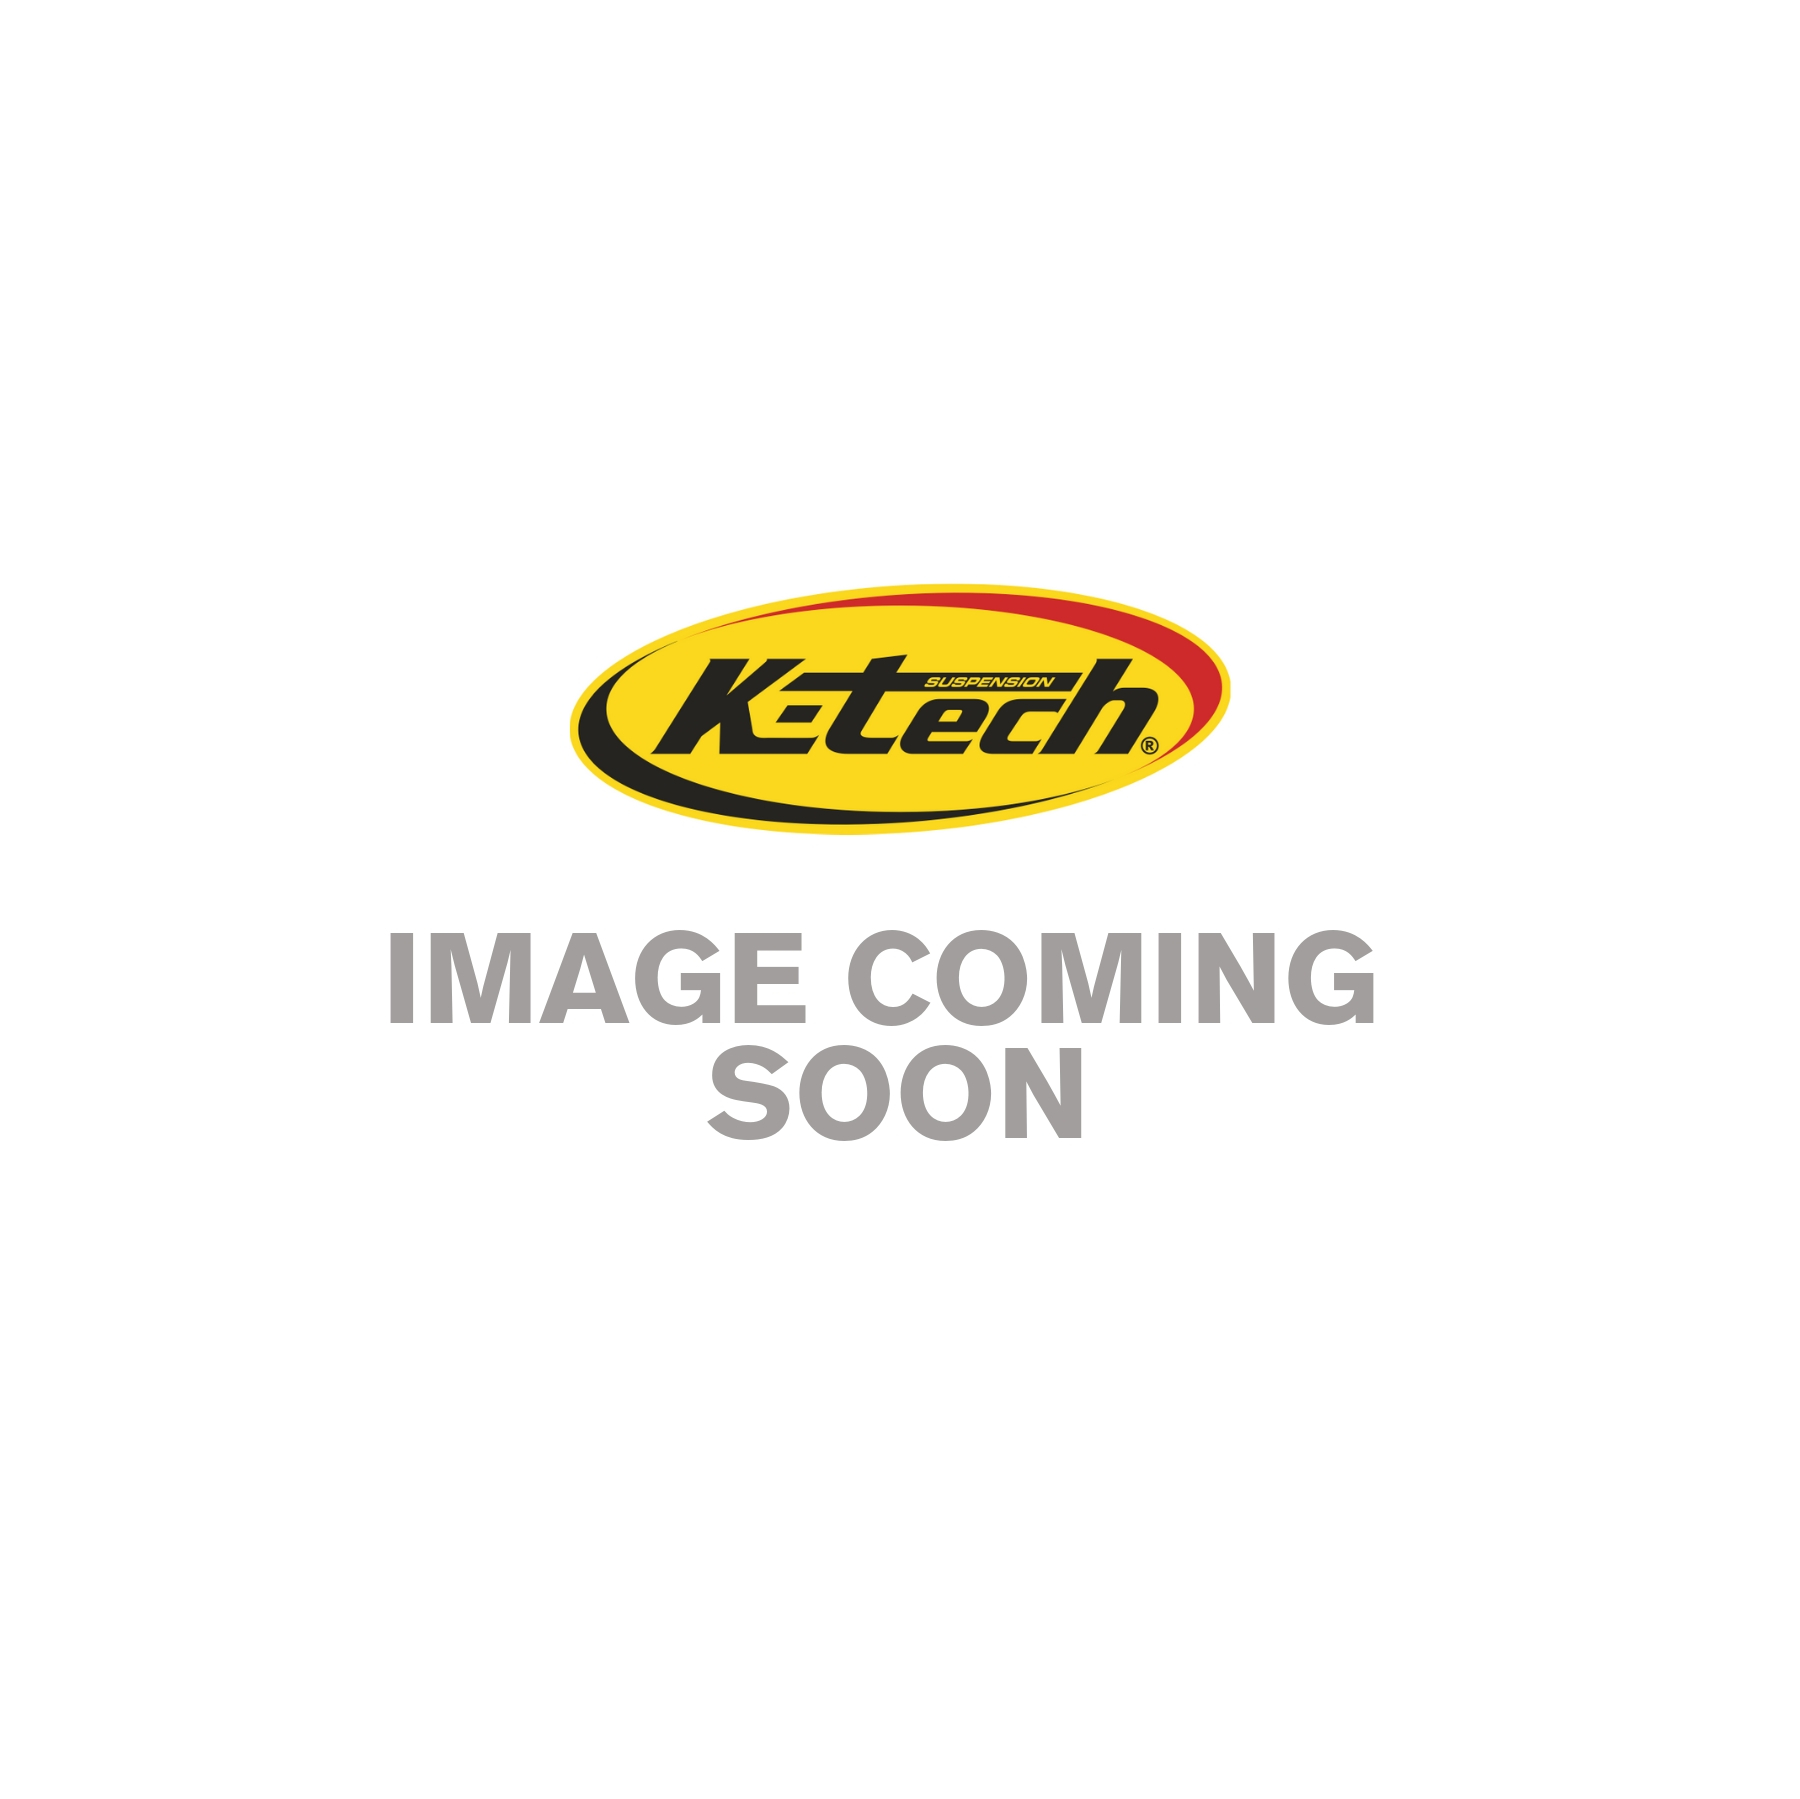 Tool - Motool Slacker Digital Sag Measurer